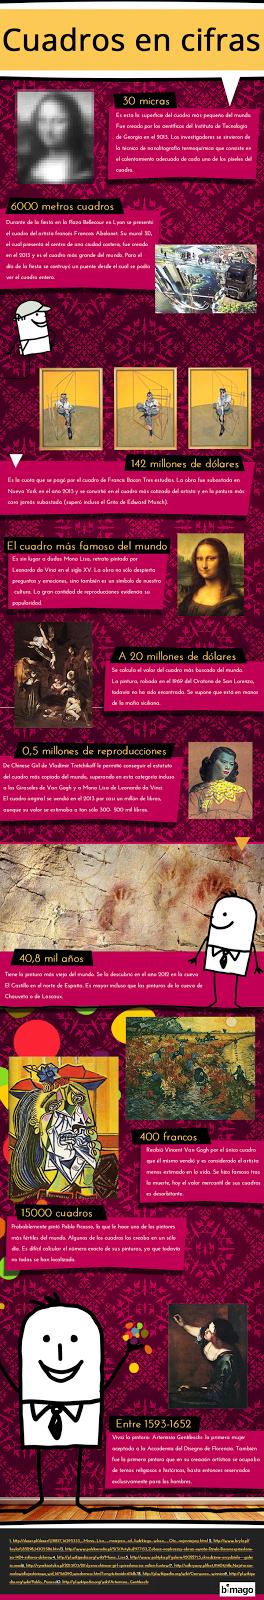 http://www.bimago.es/infografica